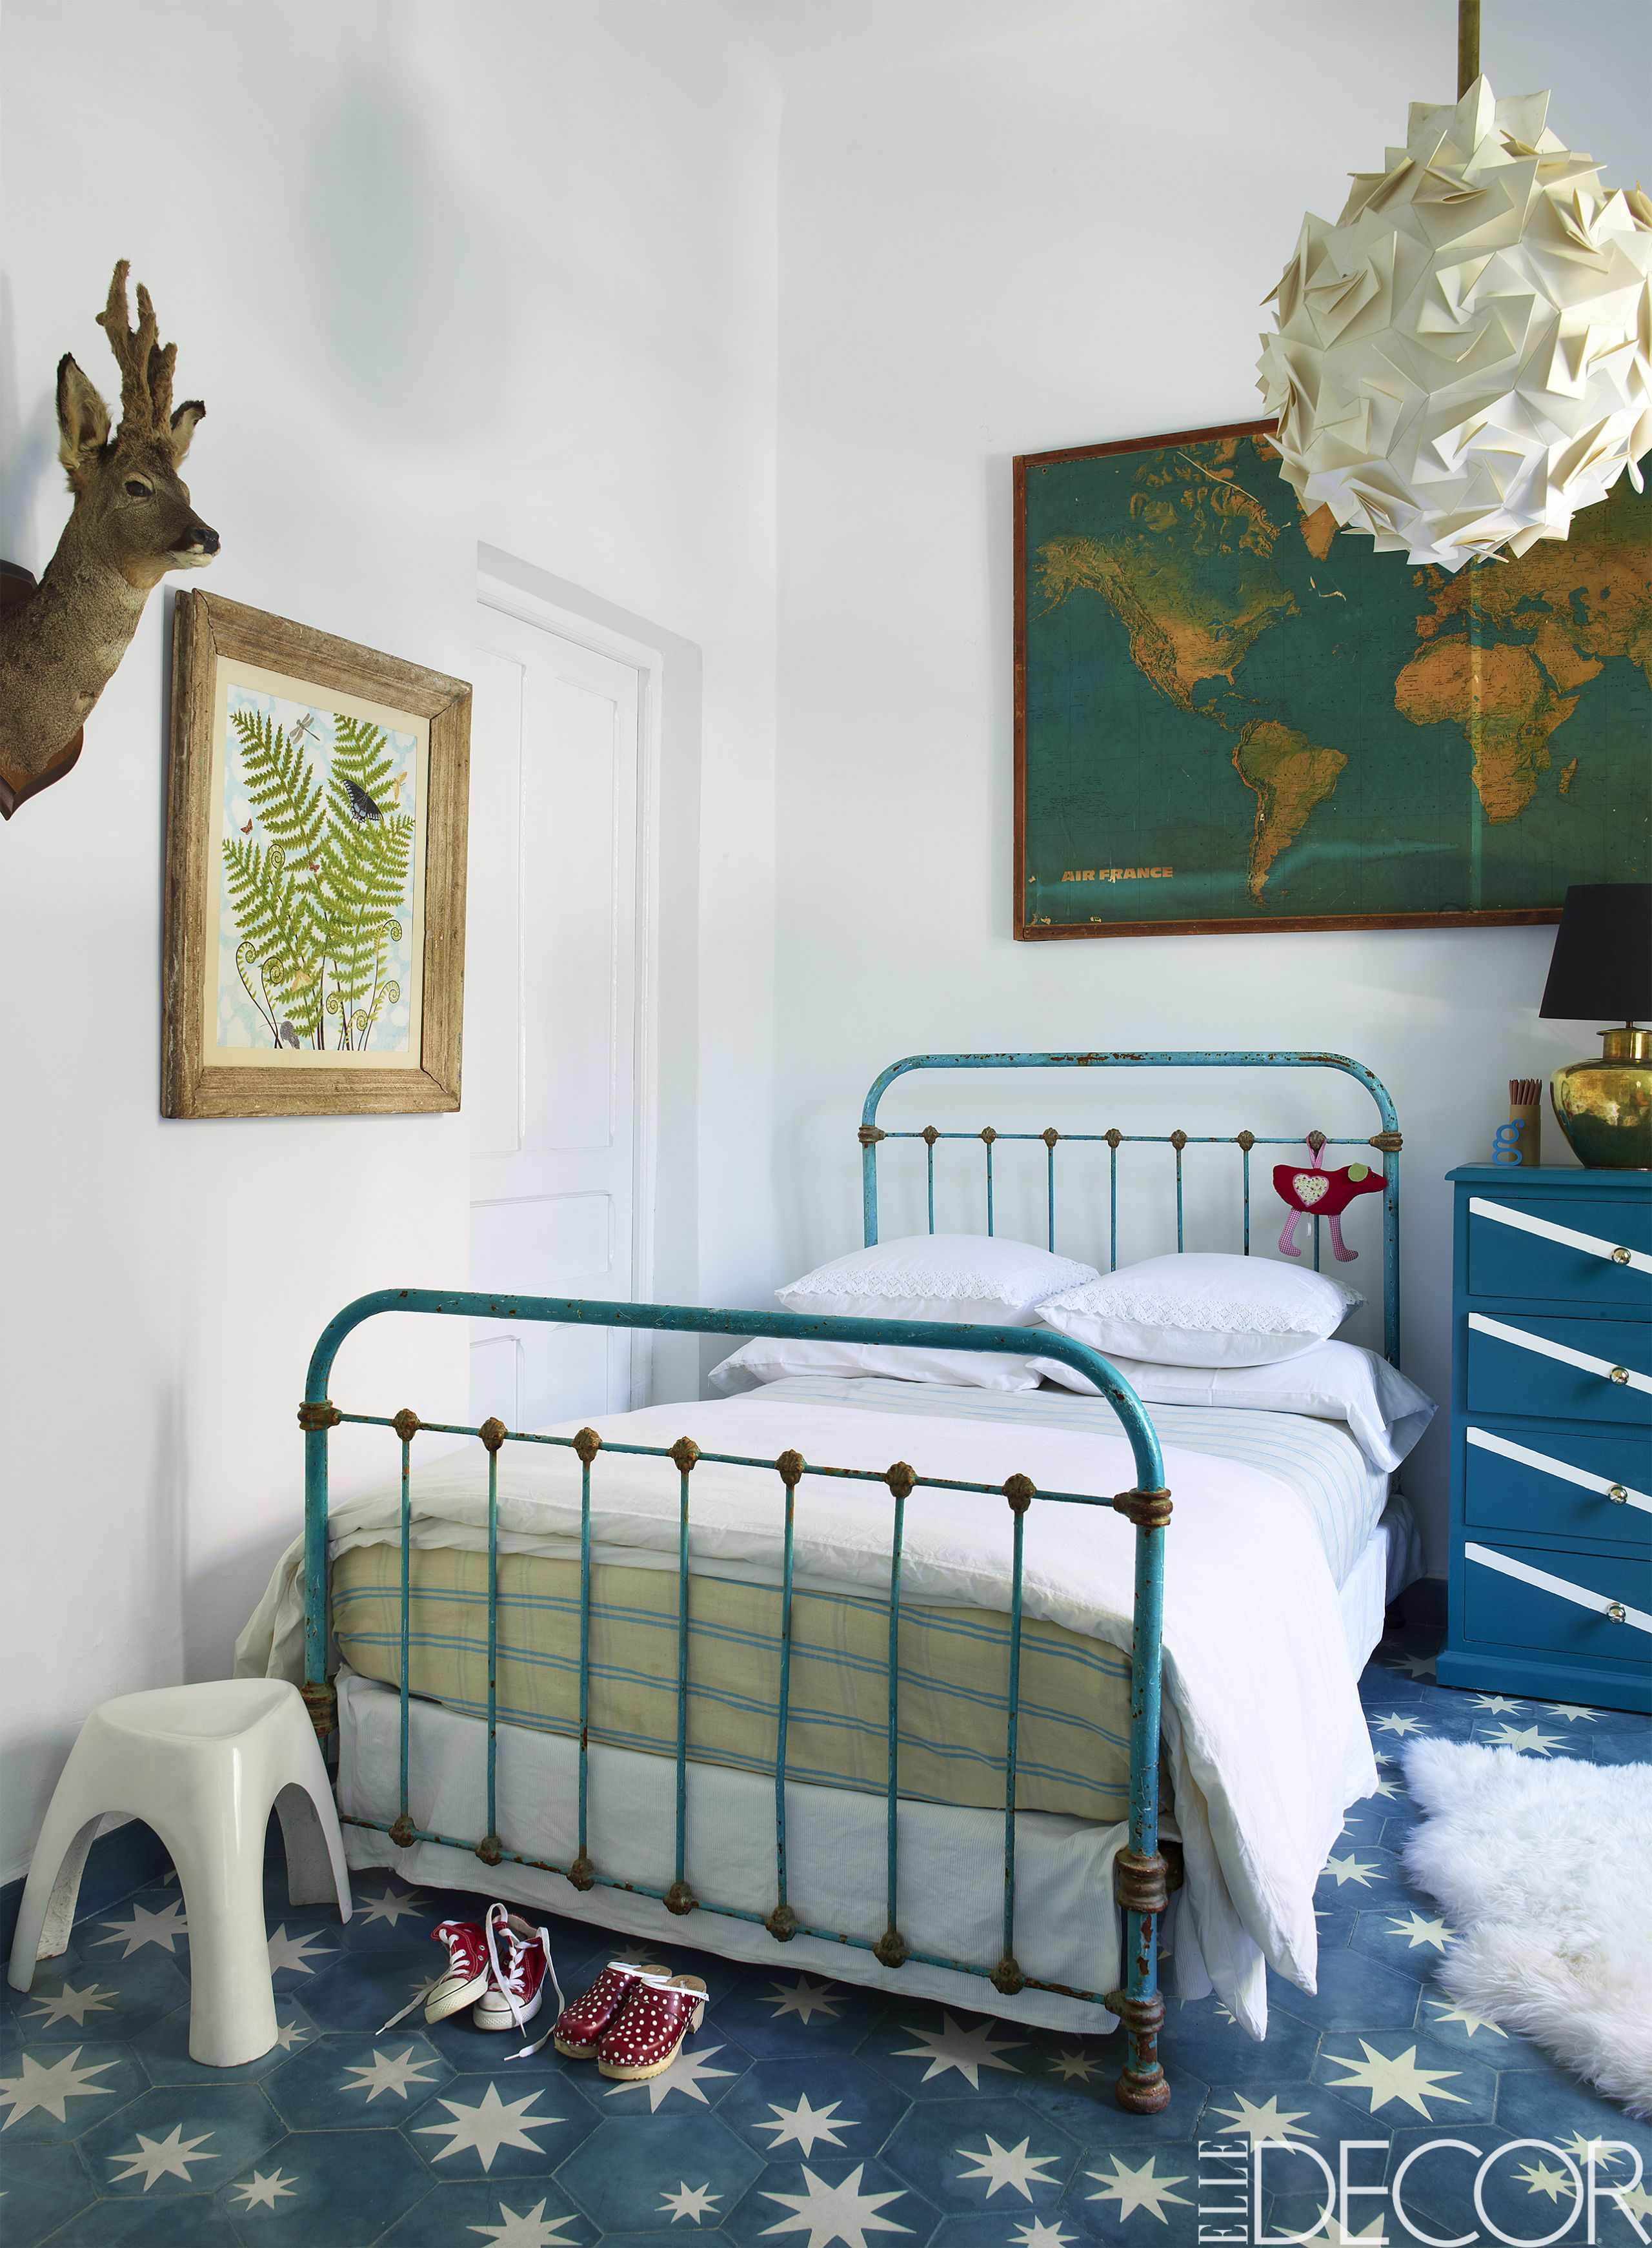 10 Girls Bedroom Decorating IdeasCreative Girls Room Decor Tips